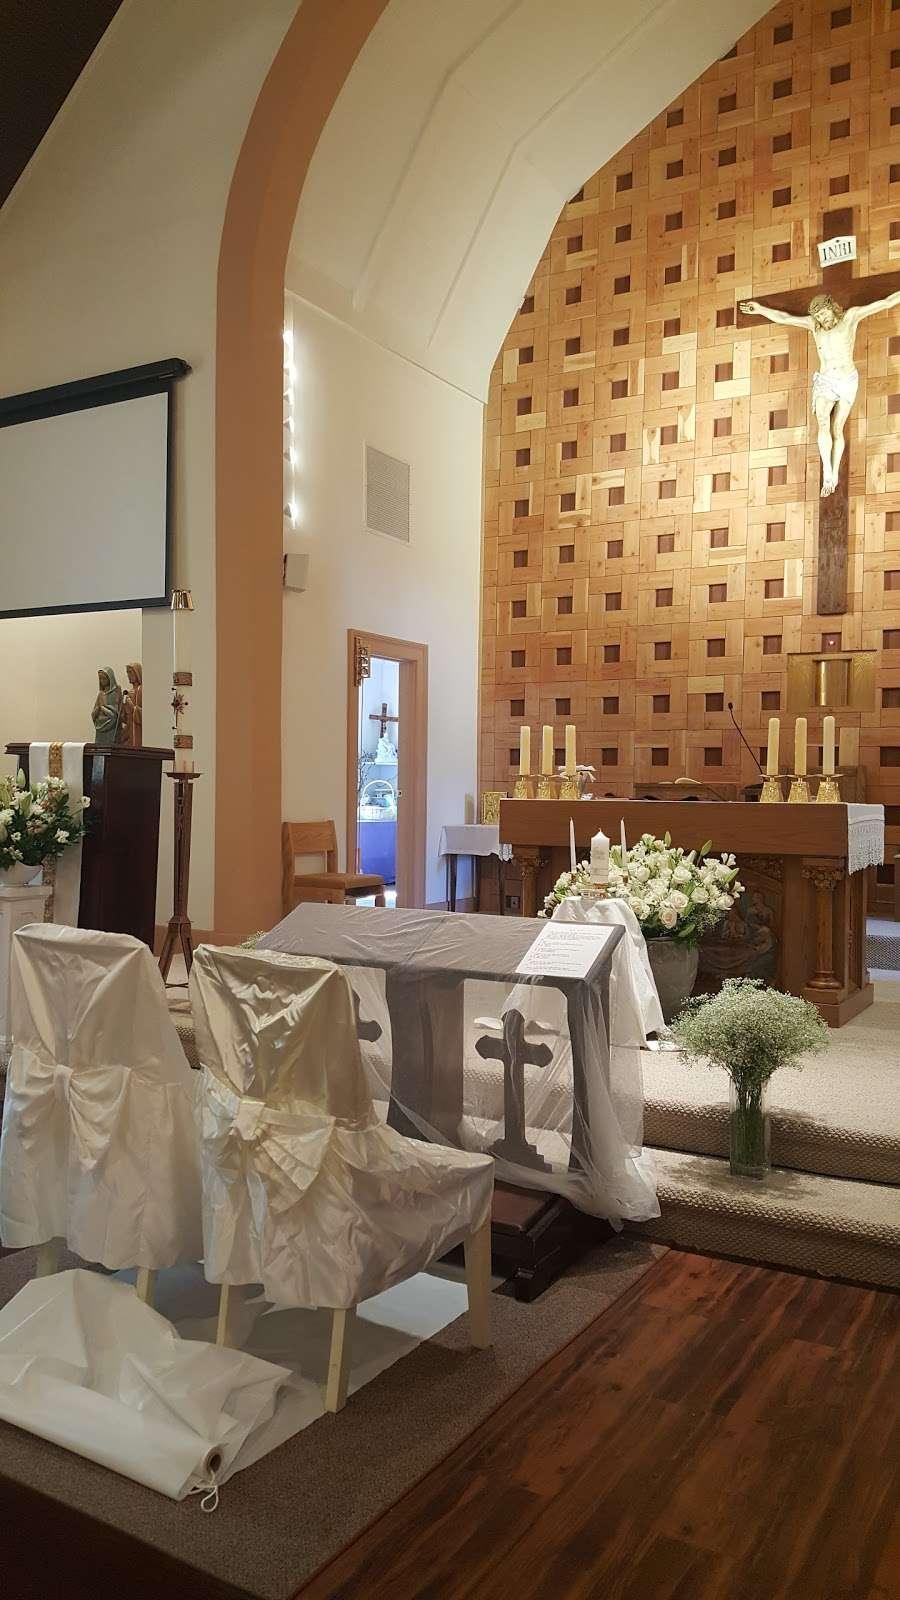 Korean Catholic Apostolate Church of Staten Island - church  | Photo 1 of 4 | Address: 74 Jackson St, Staten Island, NY 10304, USA